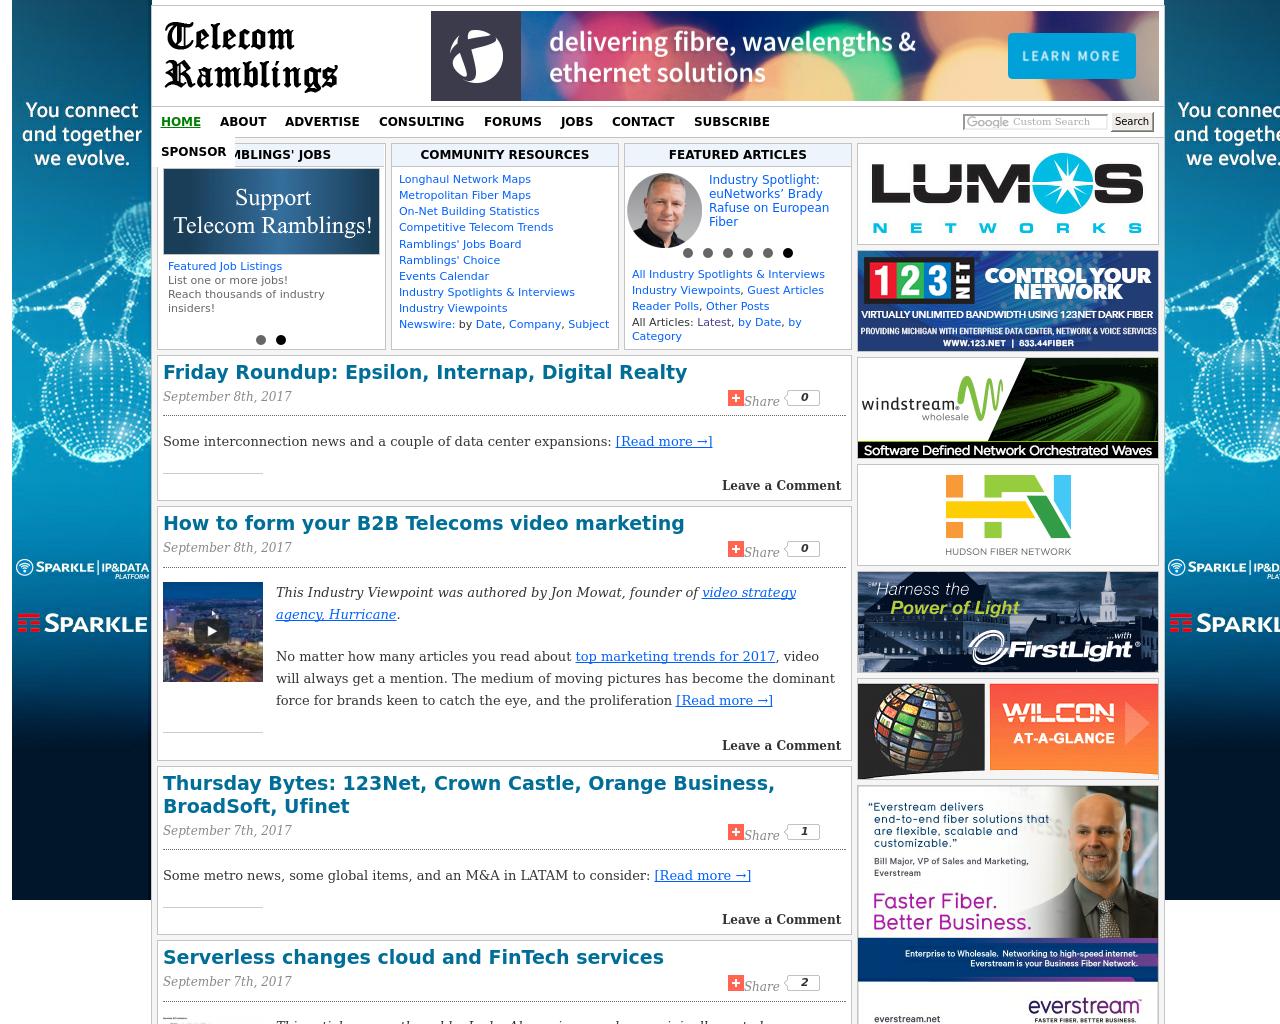 Telecom-Ramblings-Advertising-Reviews-Pricing